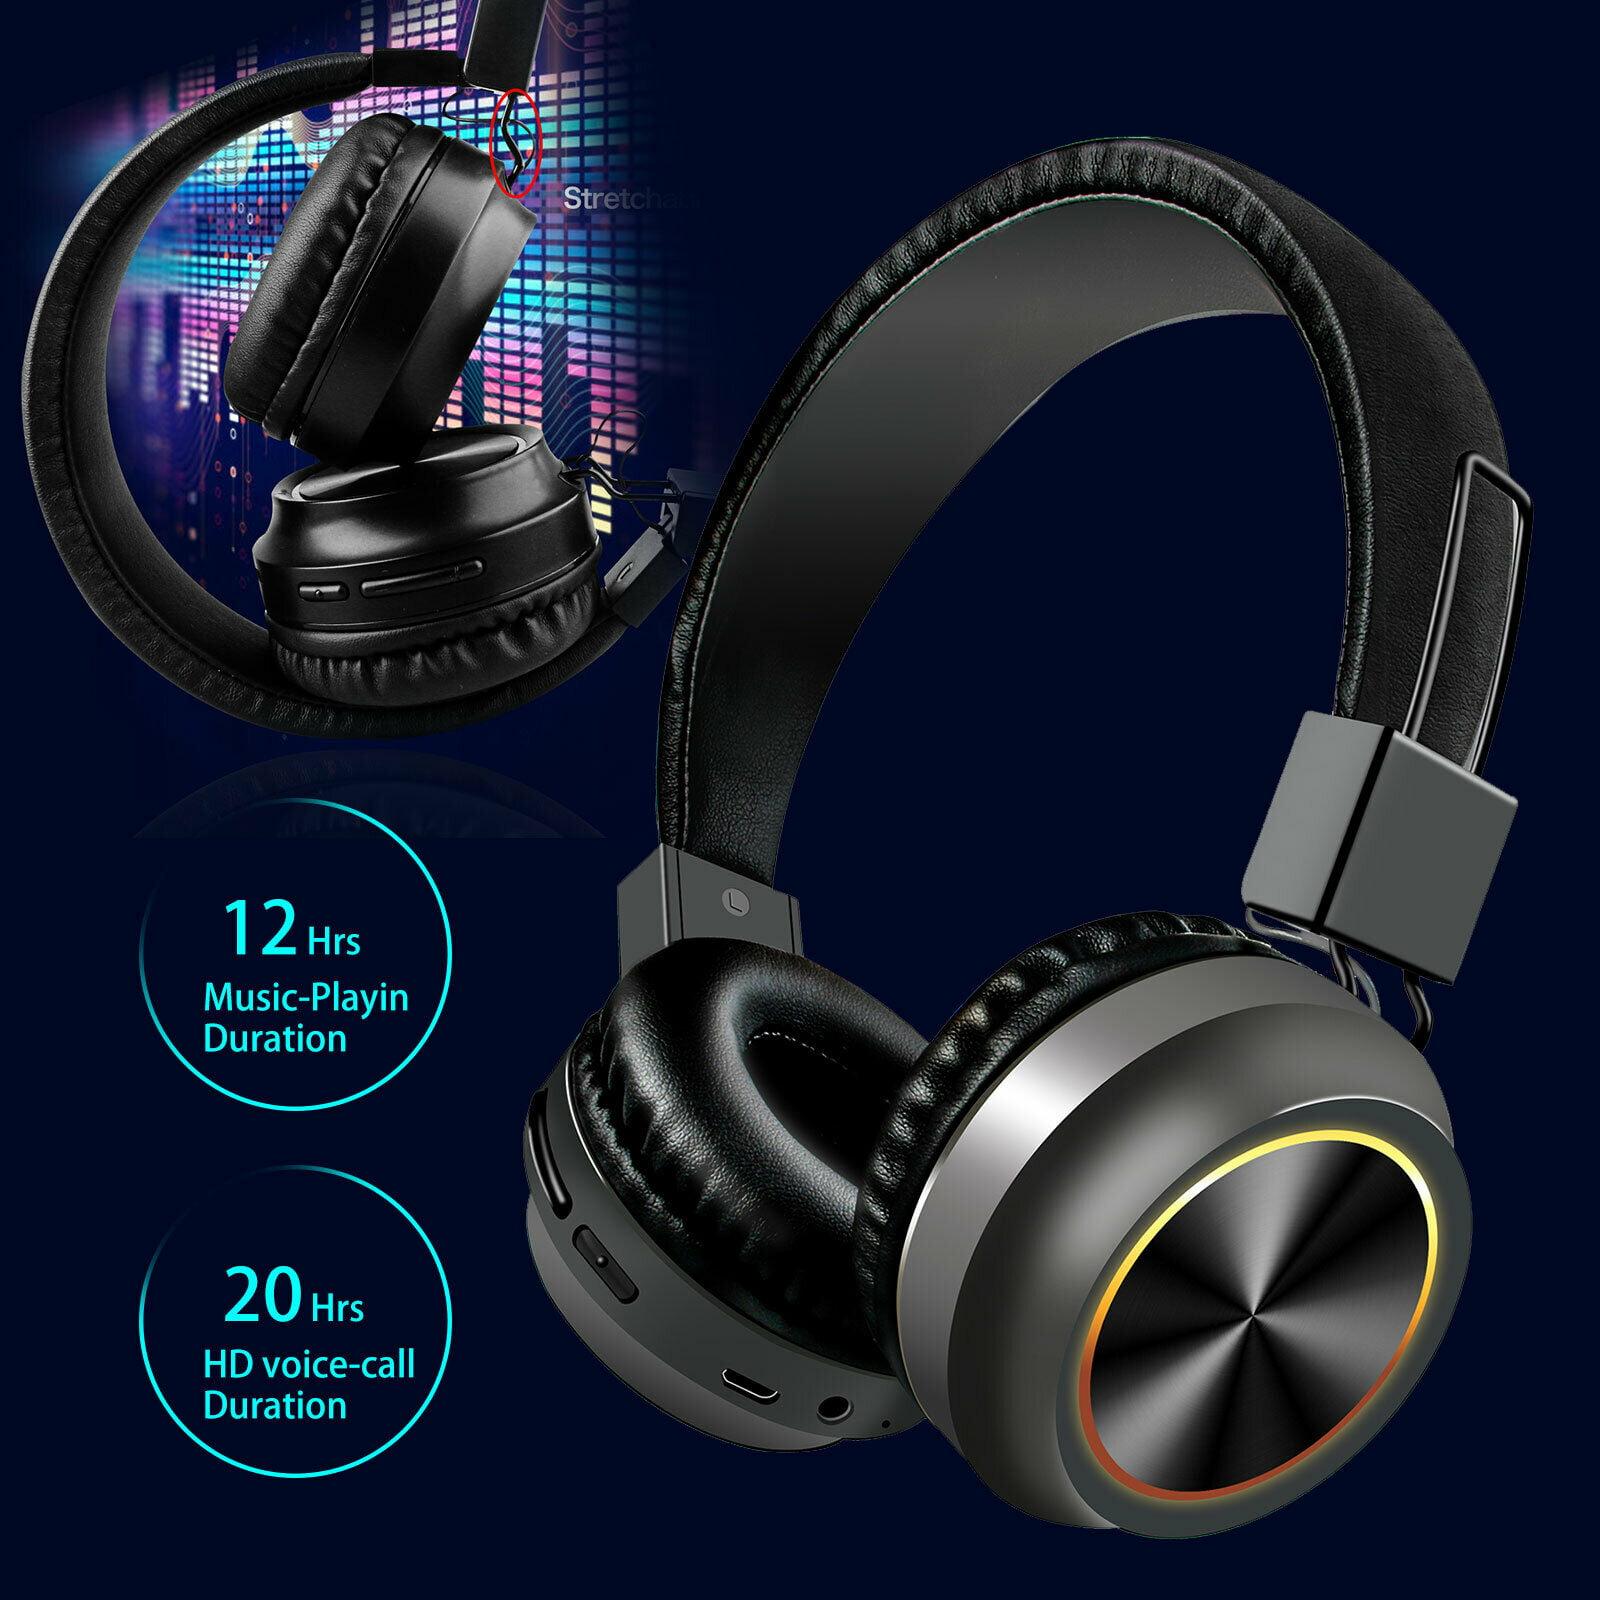 Eeekit Active Noise Cancelling Headphones Bluetooth Headphones With Mic Deep Bass Wireless Headphones Over Ear Comfortable Protein Earpads 20h Playtime For Travel Work Tv Pc Cellphone Black Walmart Com Walmart Com